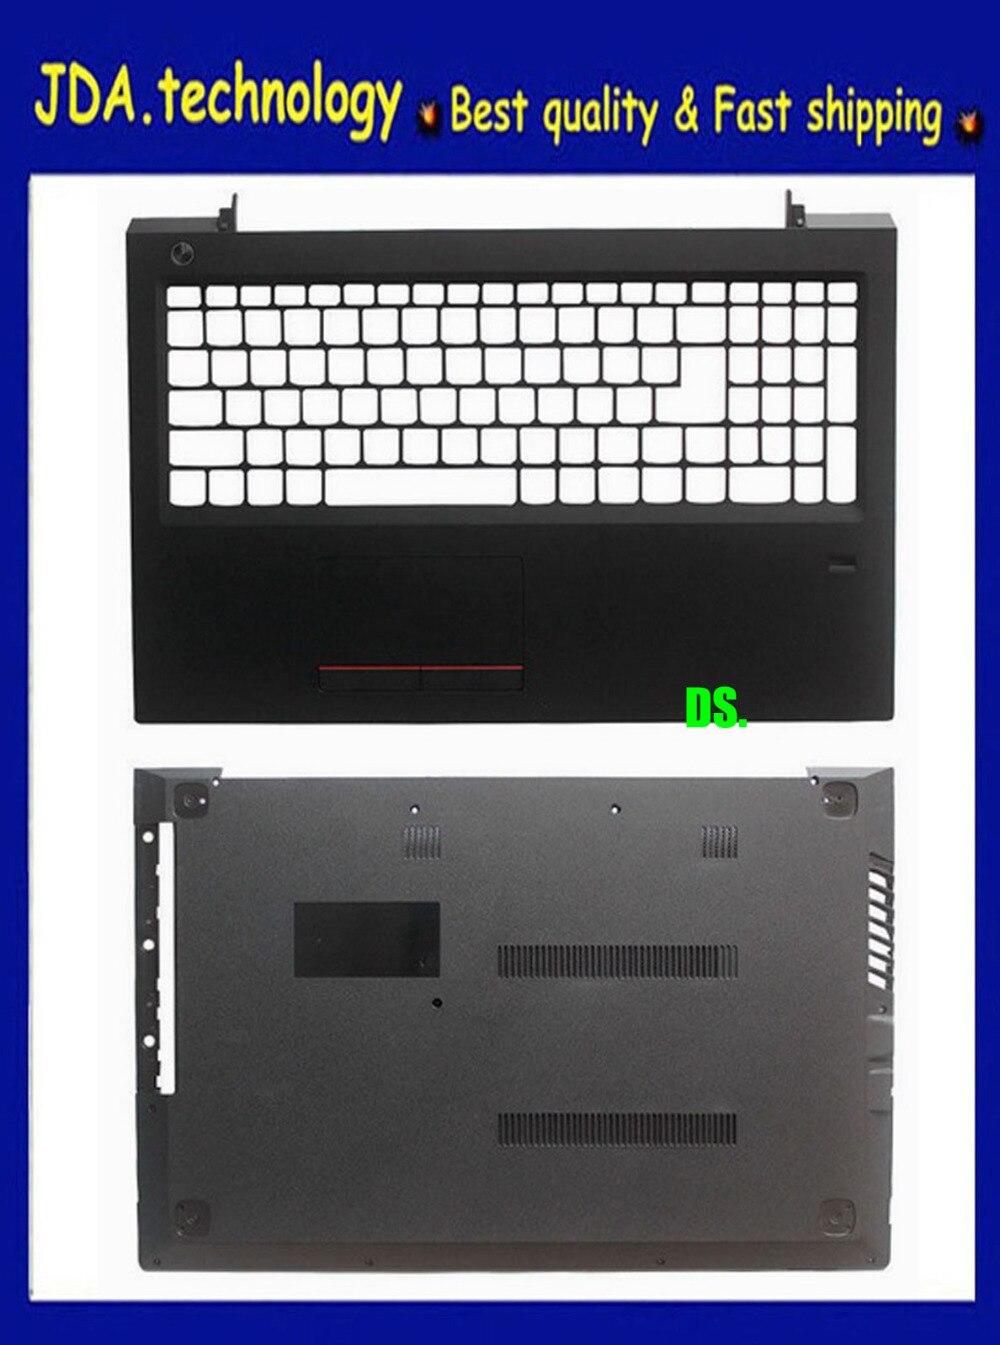 Nuevo/G para Lenovo Ideapad V310-15ISK V310-15 palmreest teclado bisel cubierta superior y cubierta base inferior